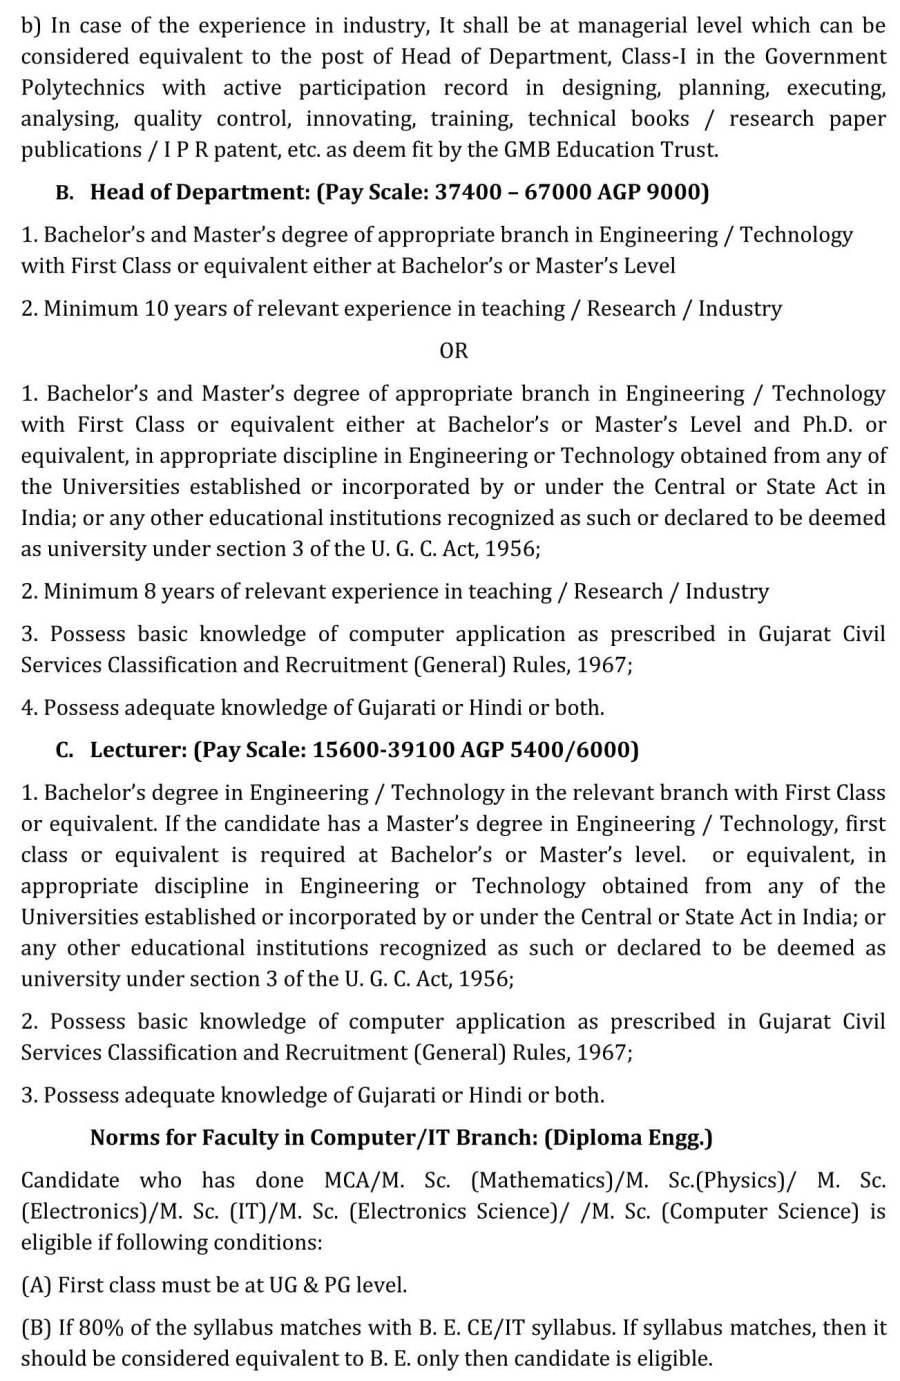 poly_rajula_recruitment_criteria-2.jpg